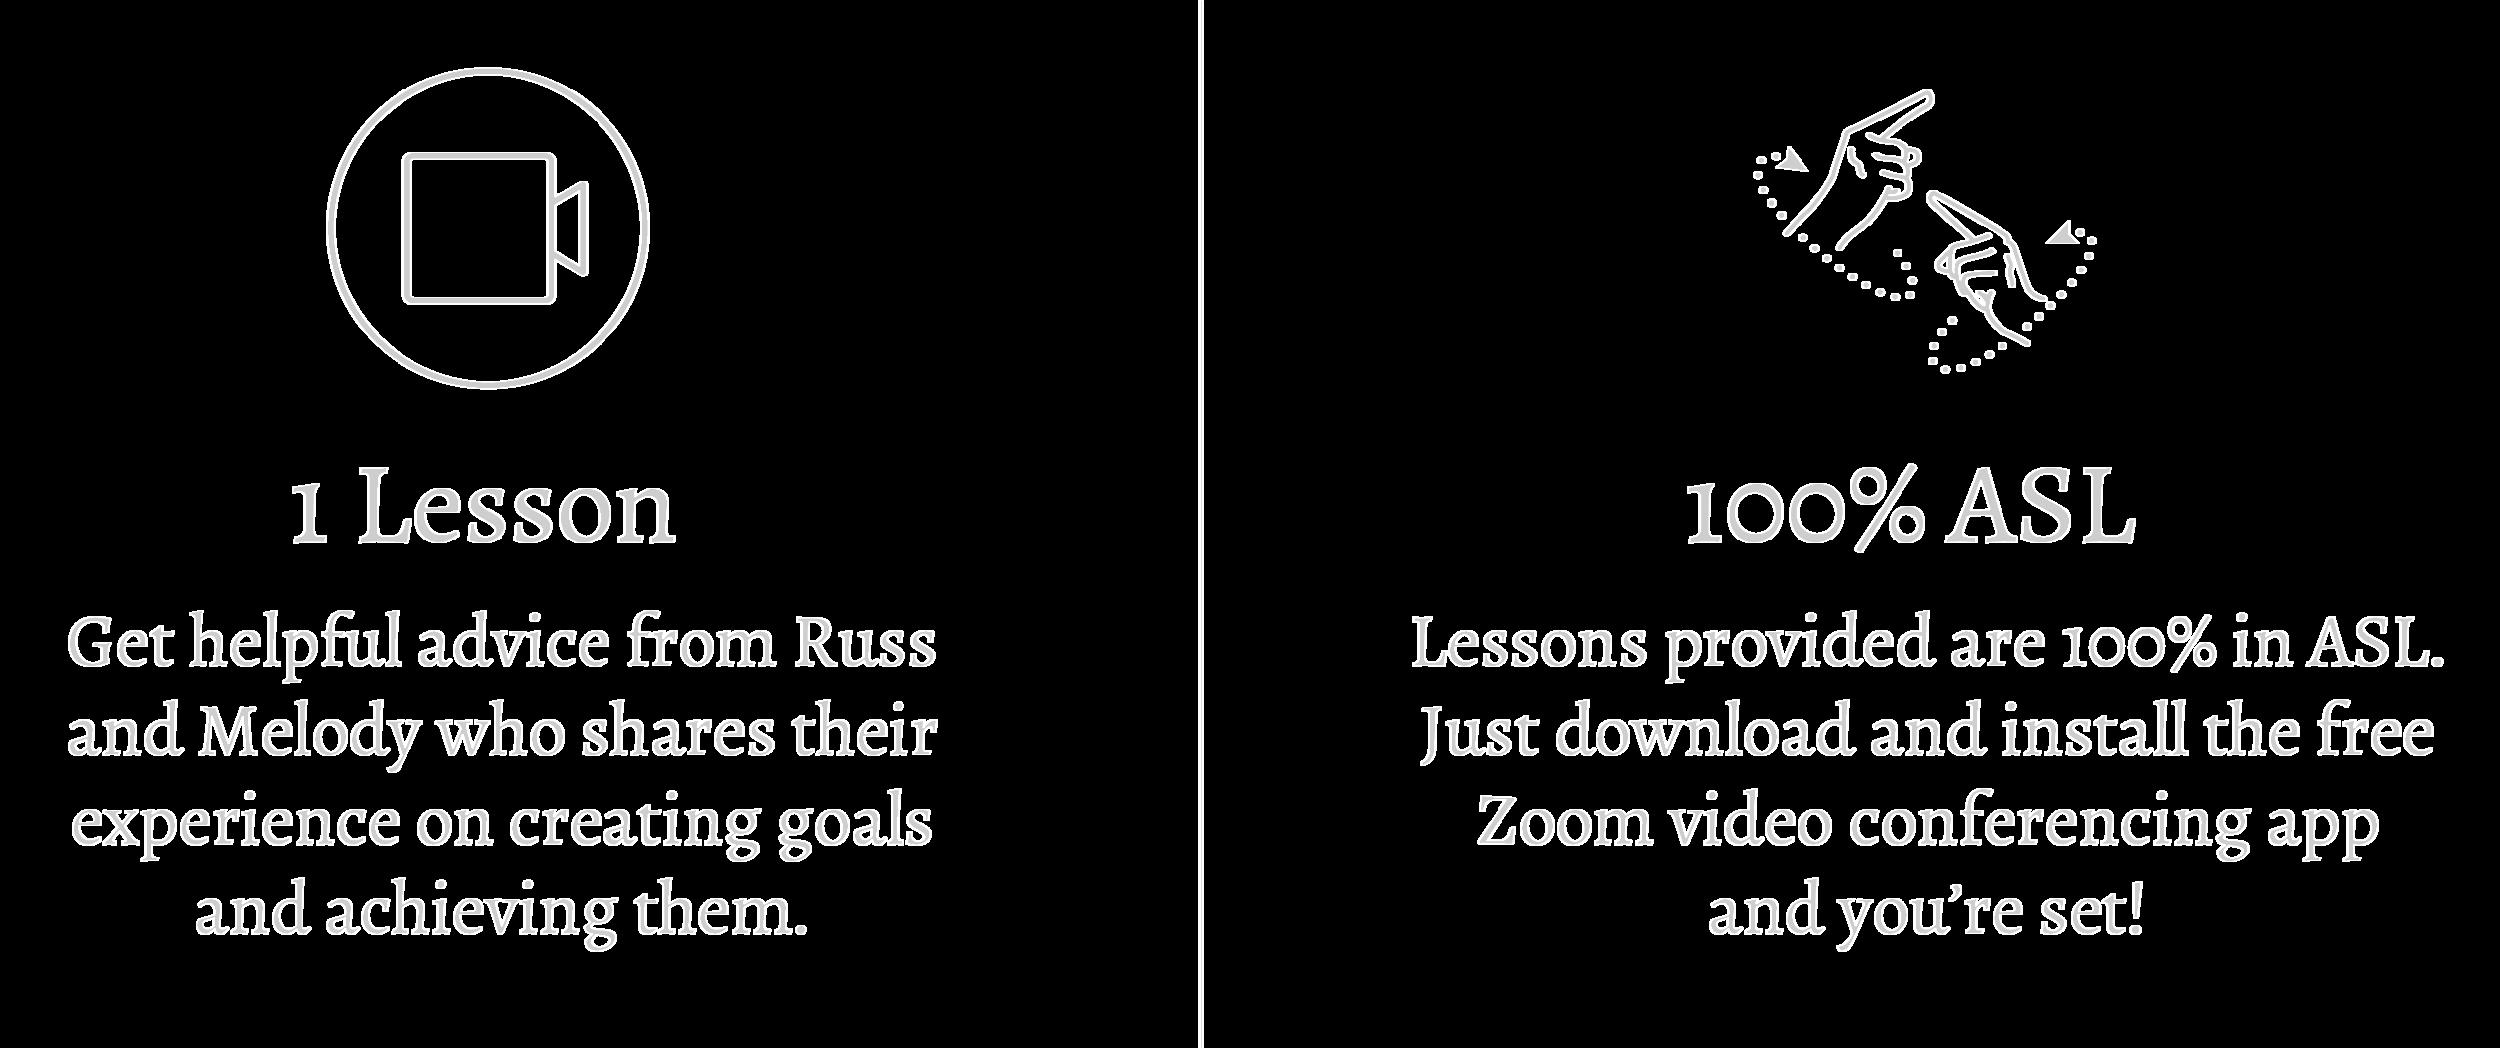 Webinar Details - How to Meet and Set Goals-01.png